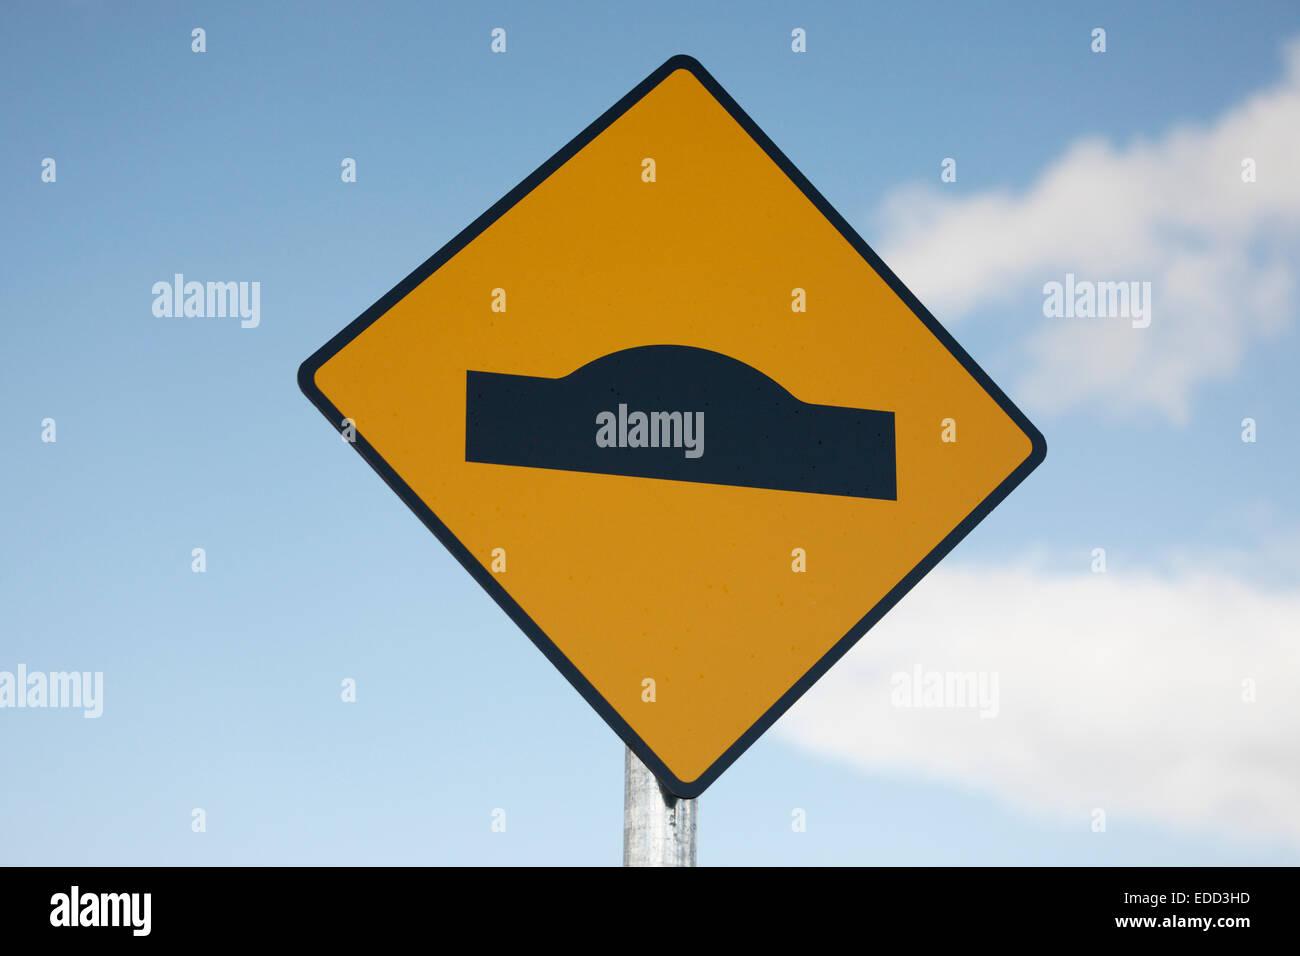 warning sign bump in road, Ireland - Stock Image